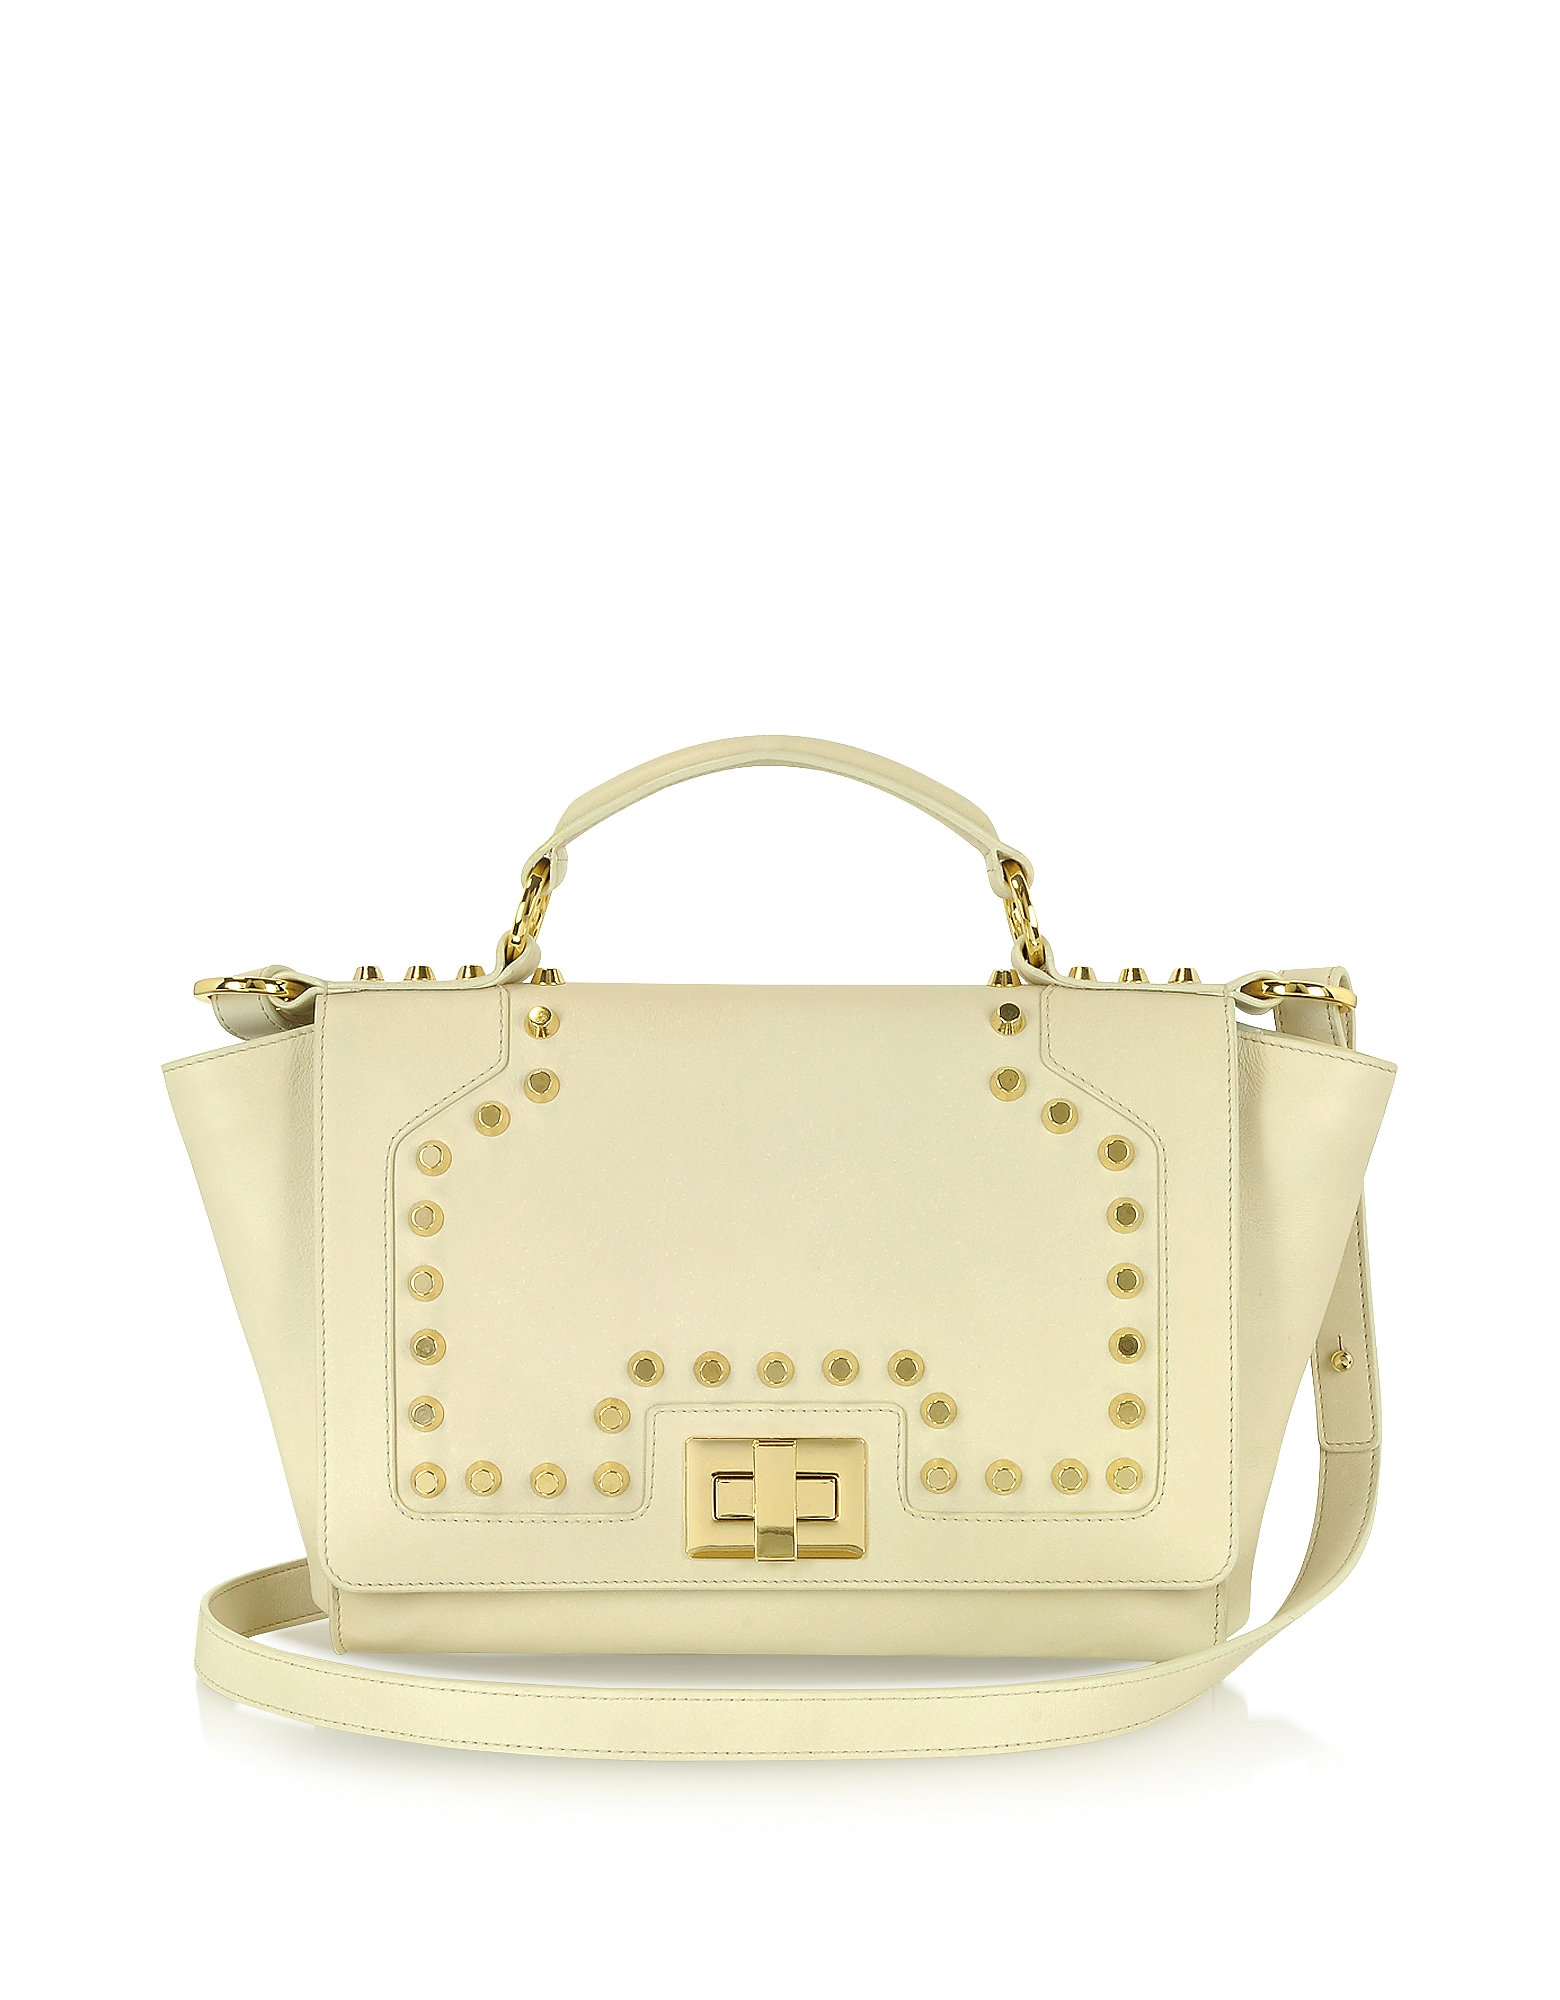 Leonardo Delfuoco Designer Handbags, Studded Beige Leather iPad Bag